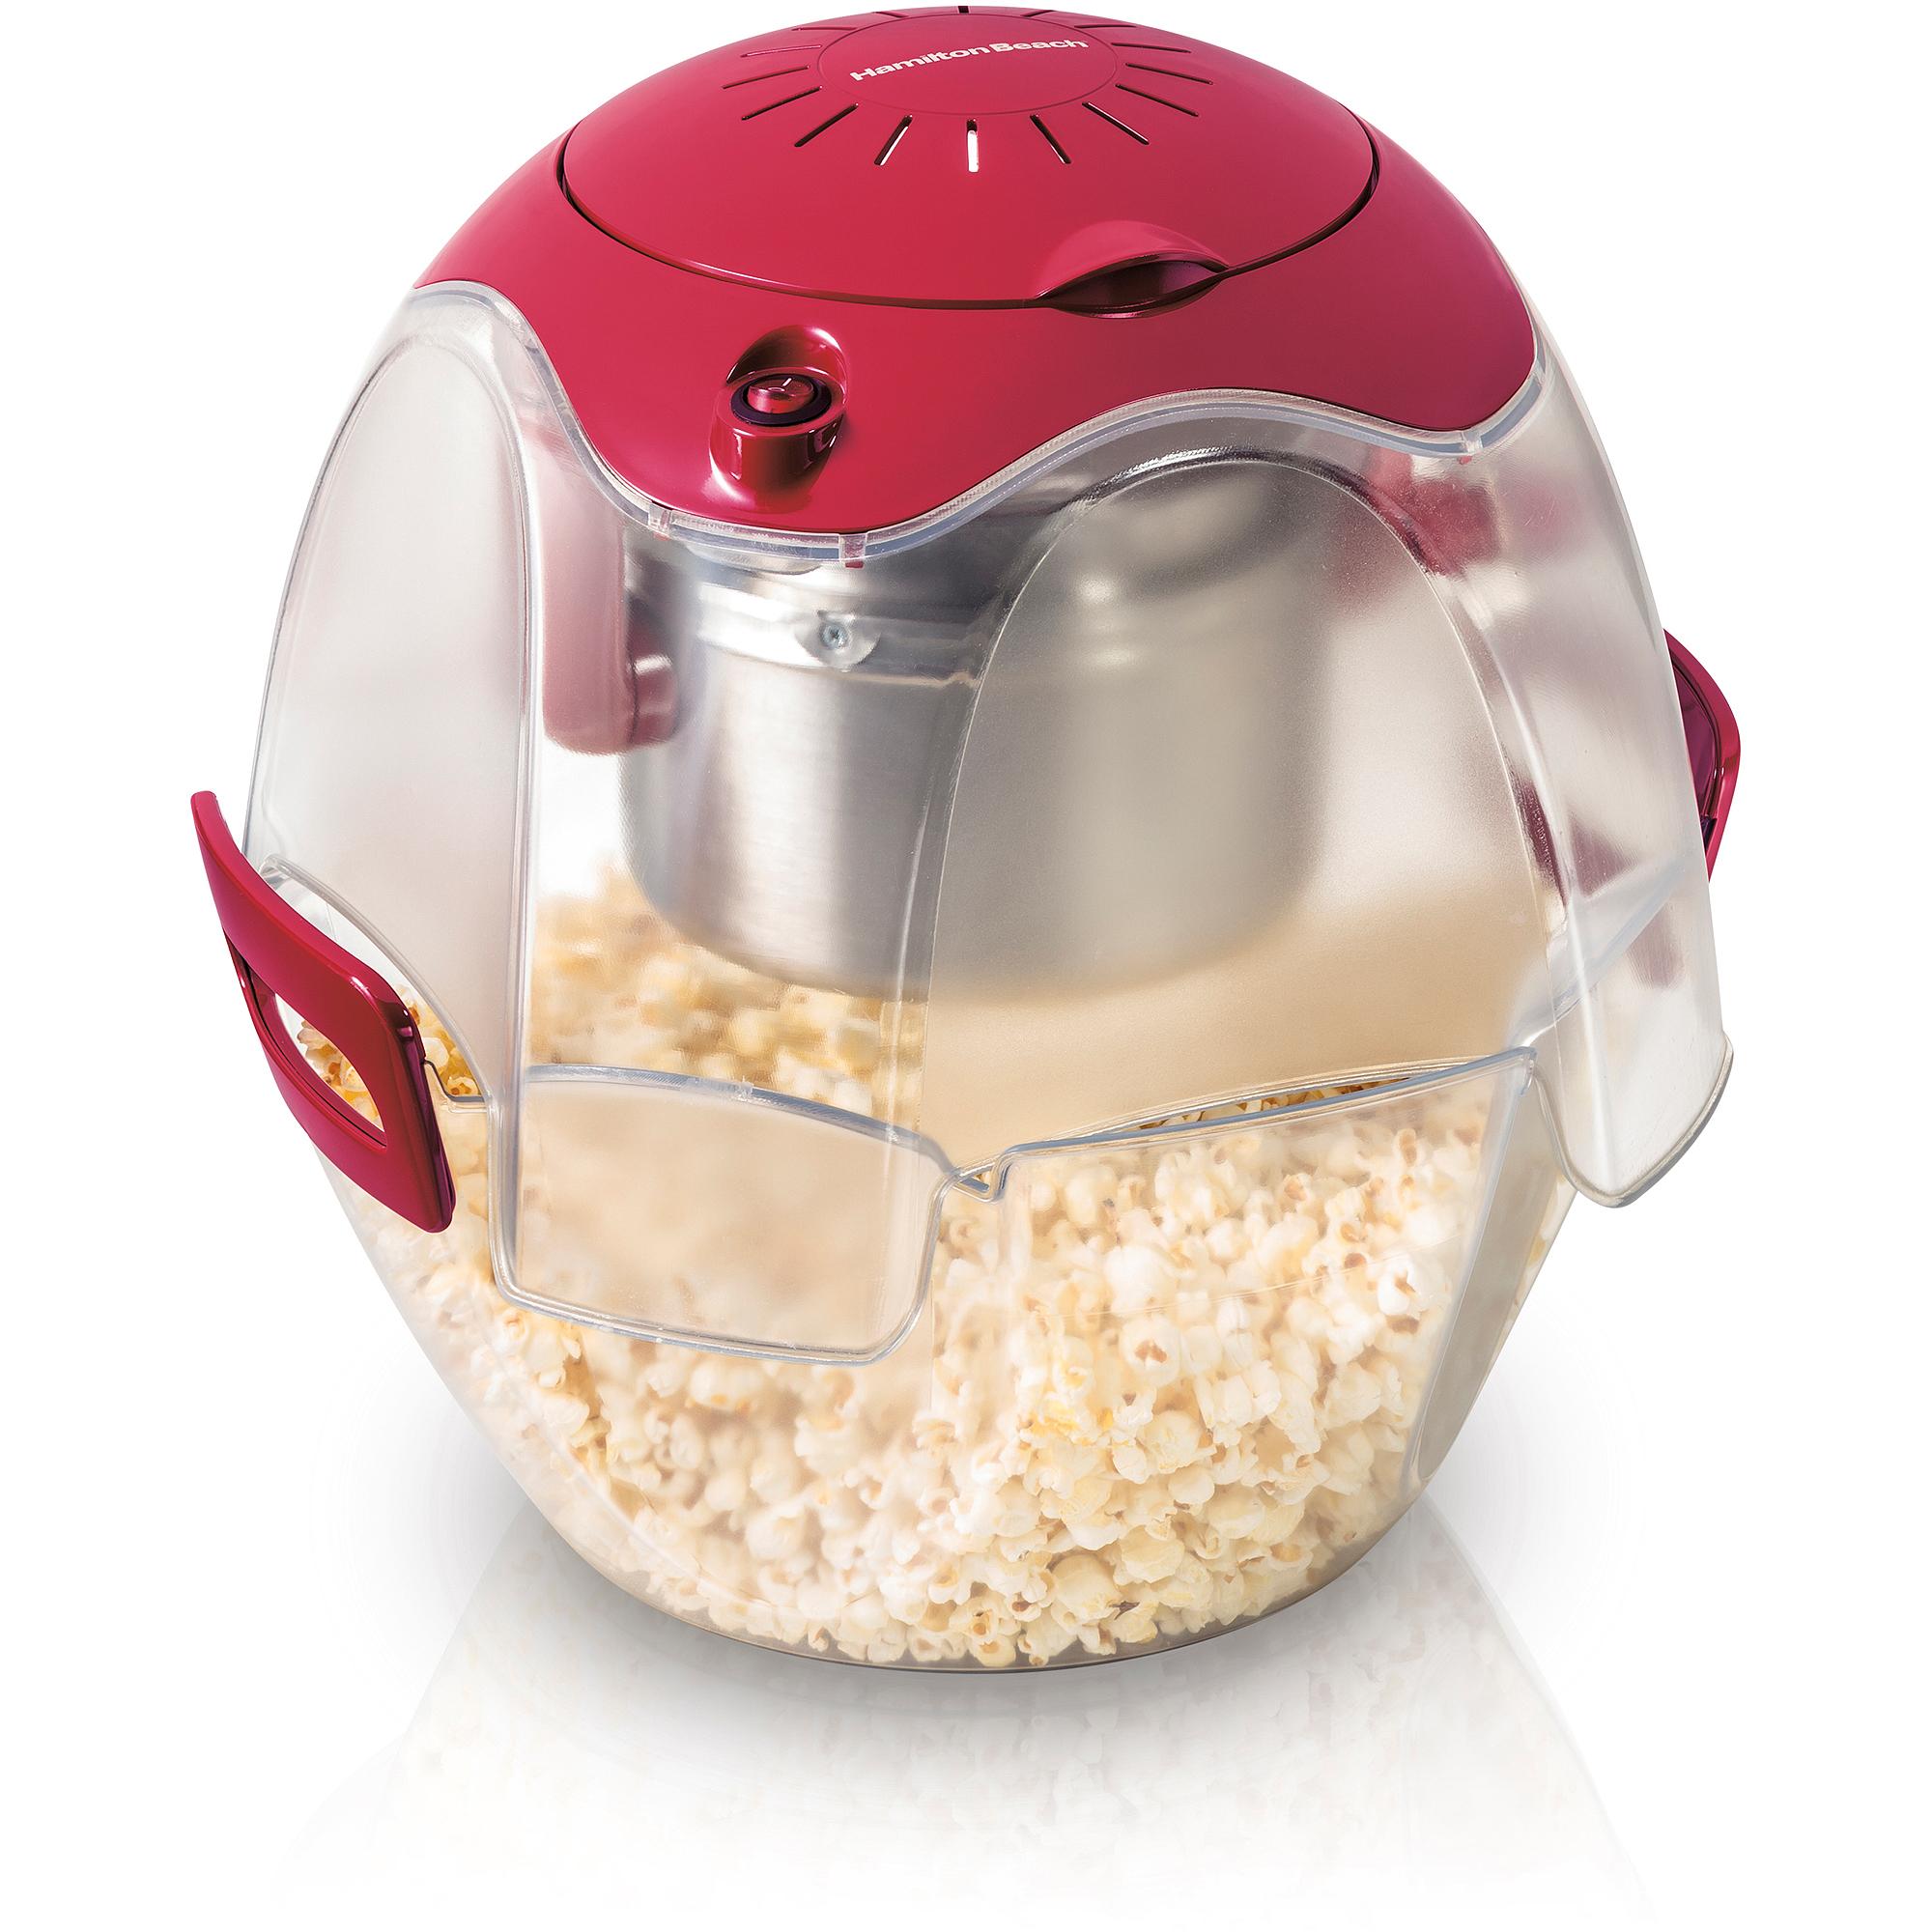 Hamilton Beach Party Popcorn Maker | Model# 73310